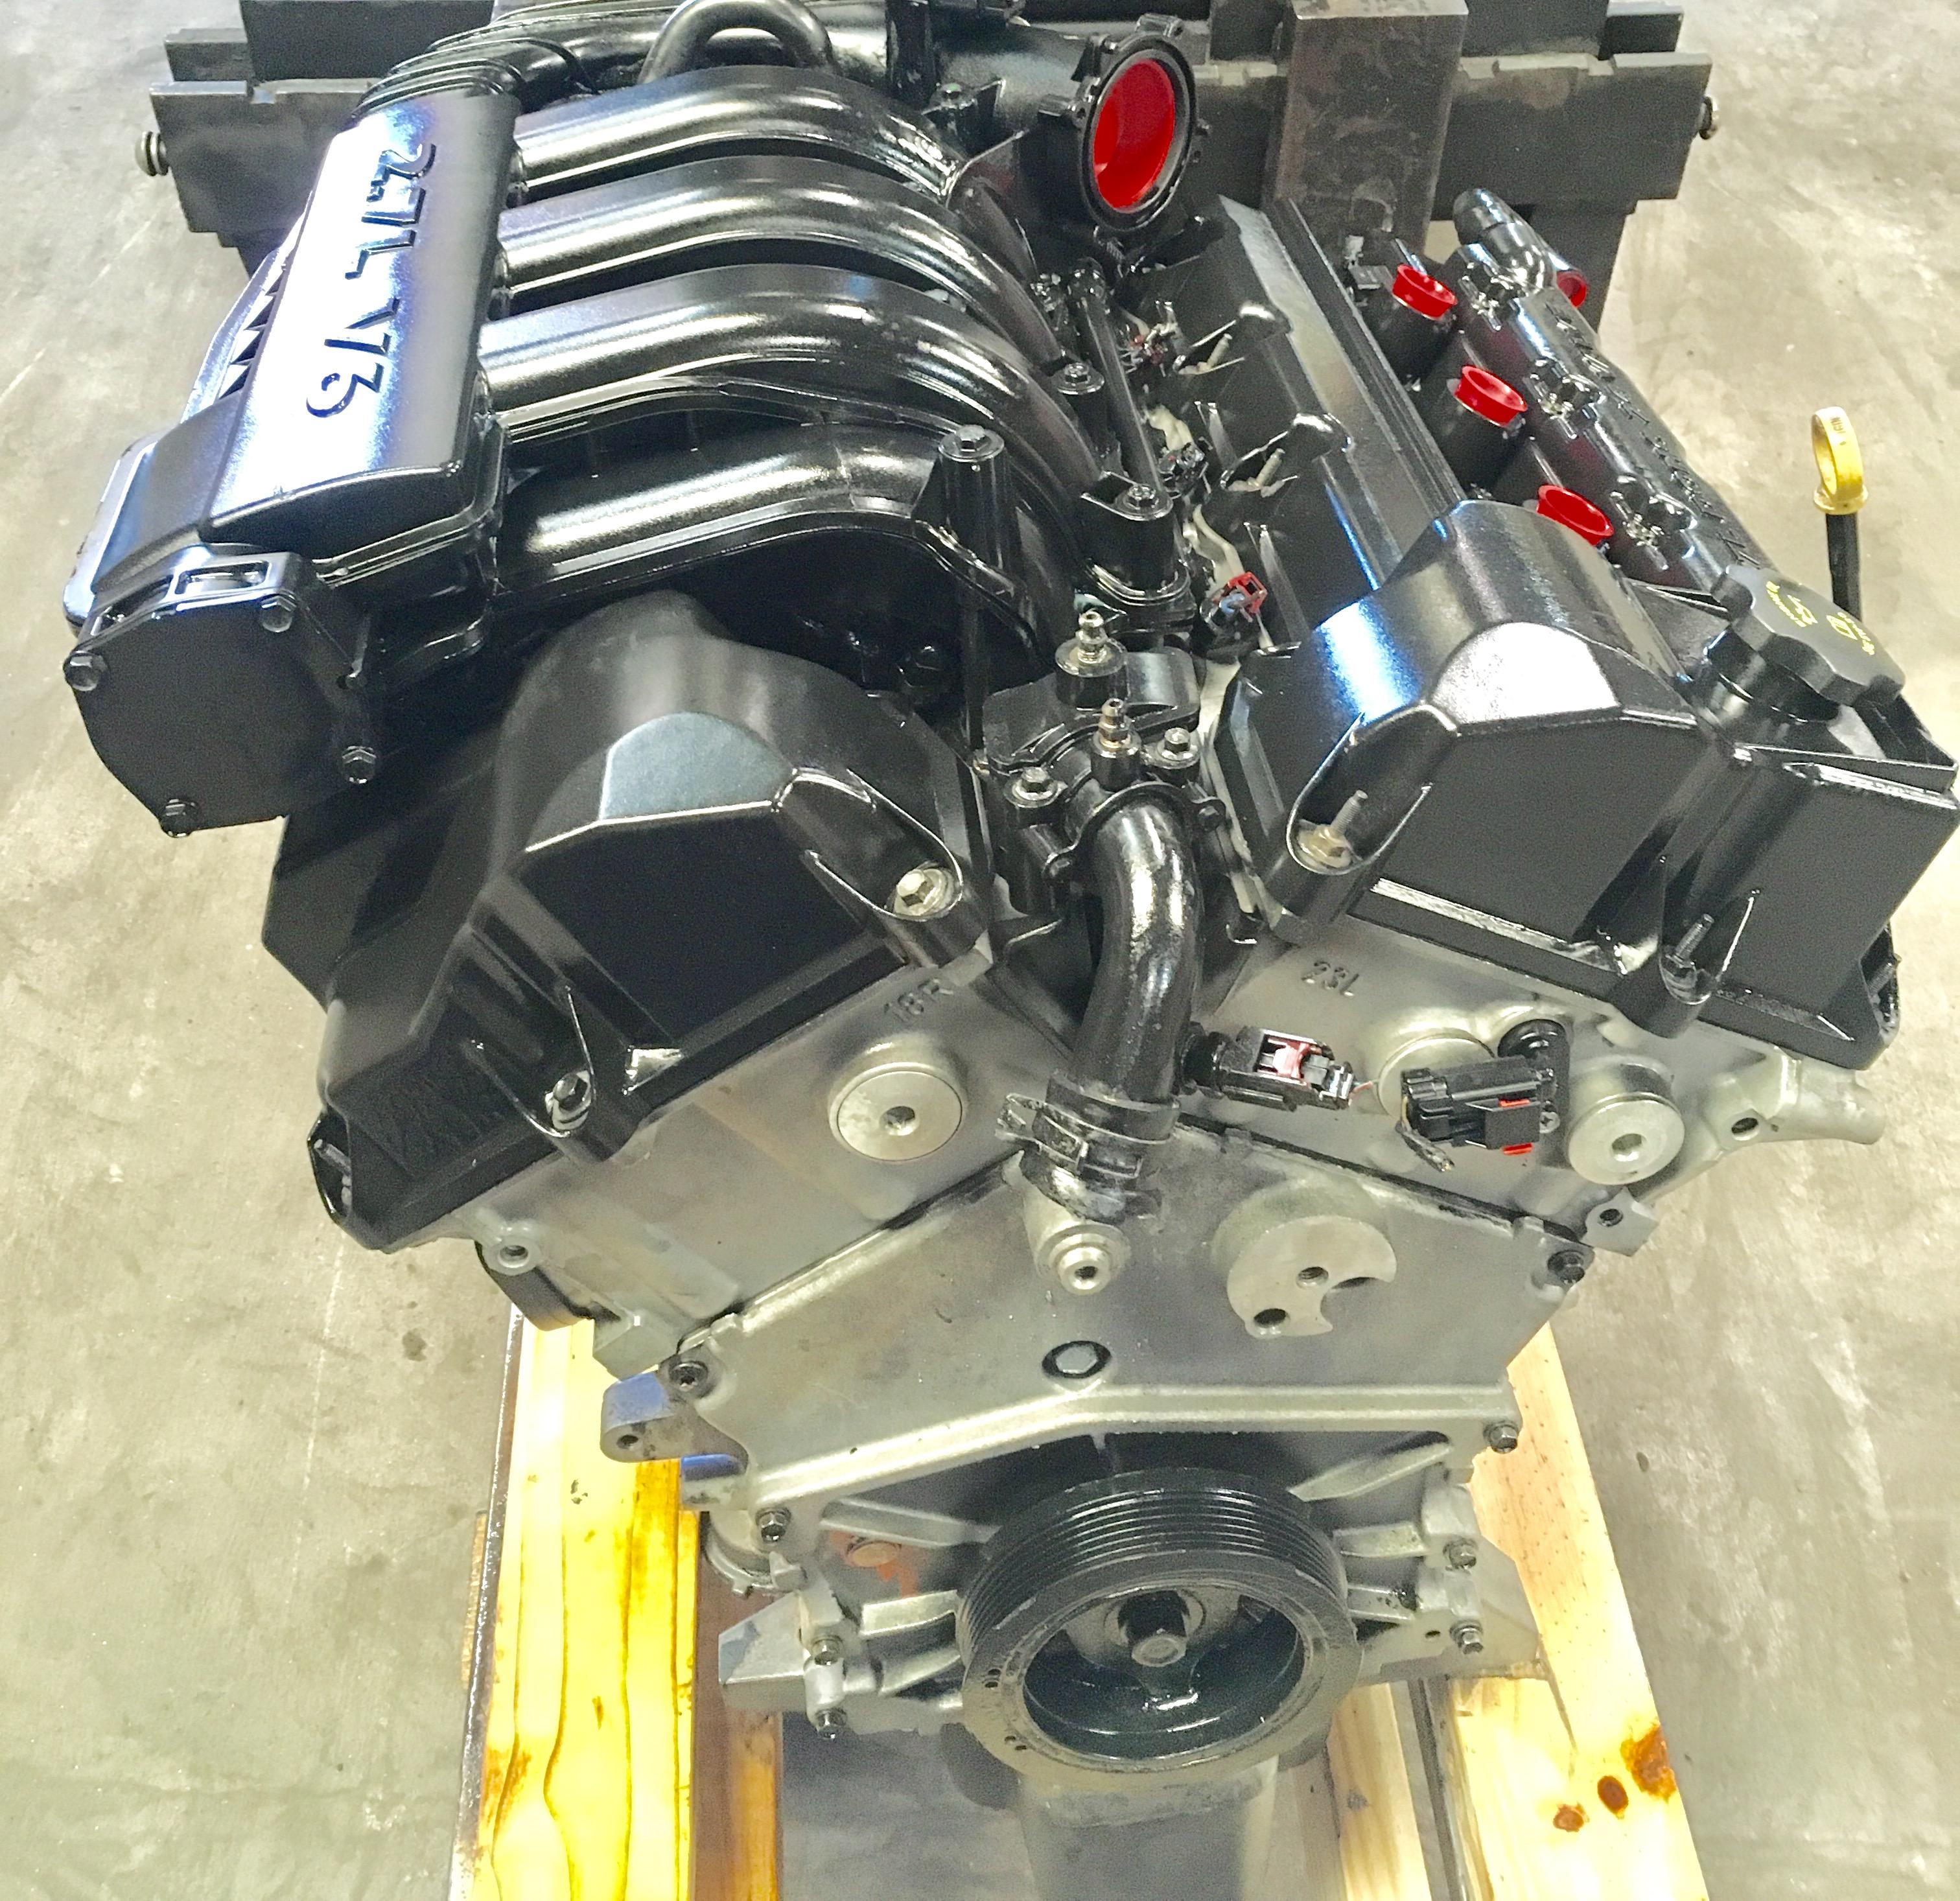 [SCHEMATICS_49CH]  DM_1321] 08 Dodge Charger Engine Diagram Download Diagram | Dodge Magnum Se Engine Diagram |  | Vira Subd Lite Tixat Rosz Trons Mohammedshrine Librar Wiring 101